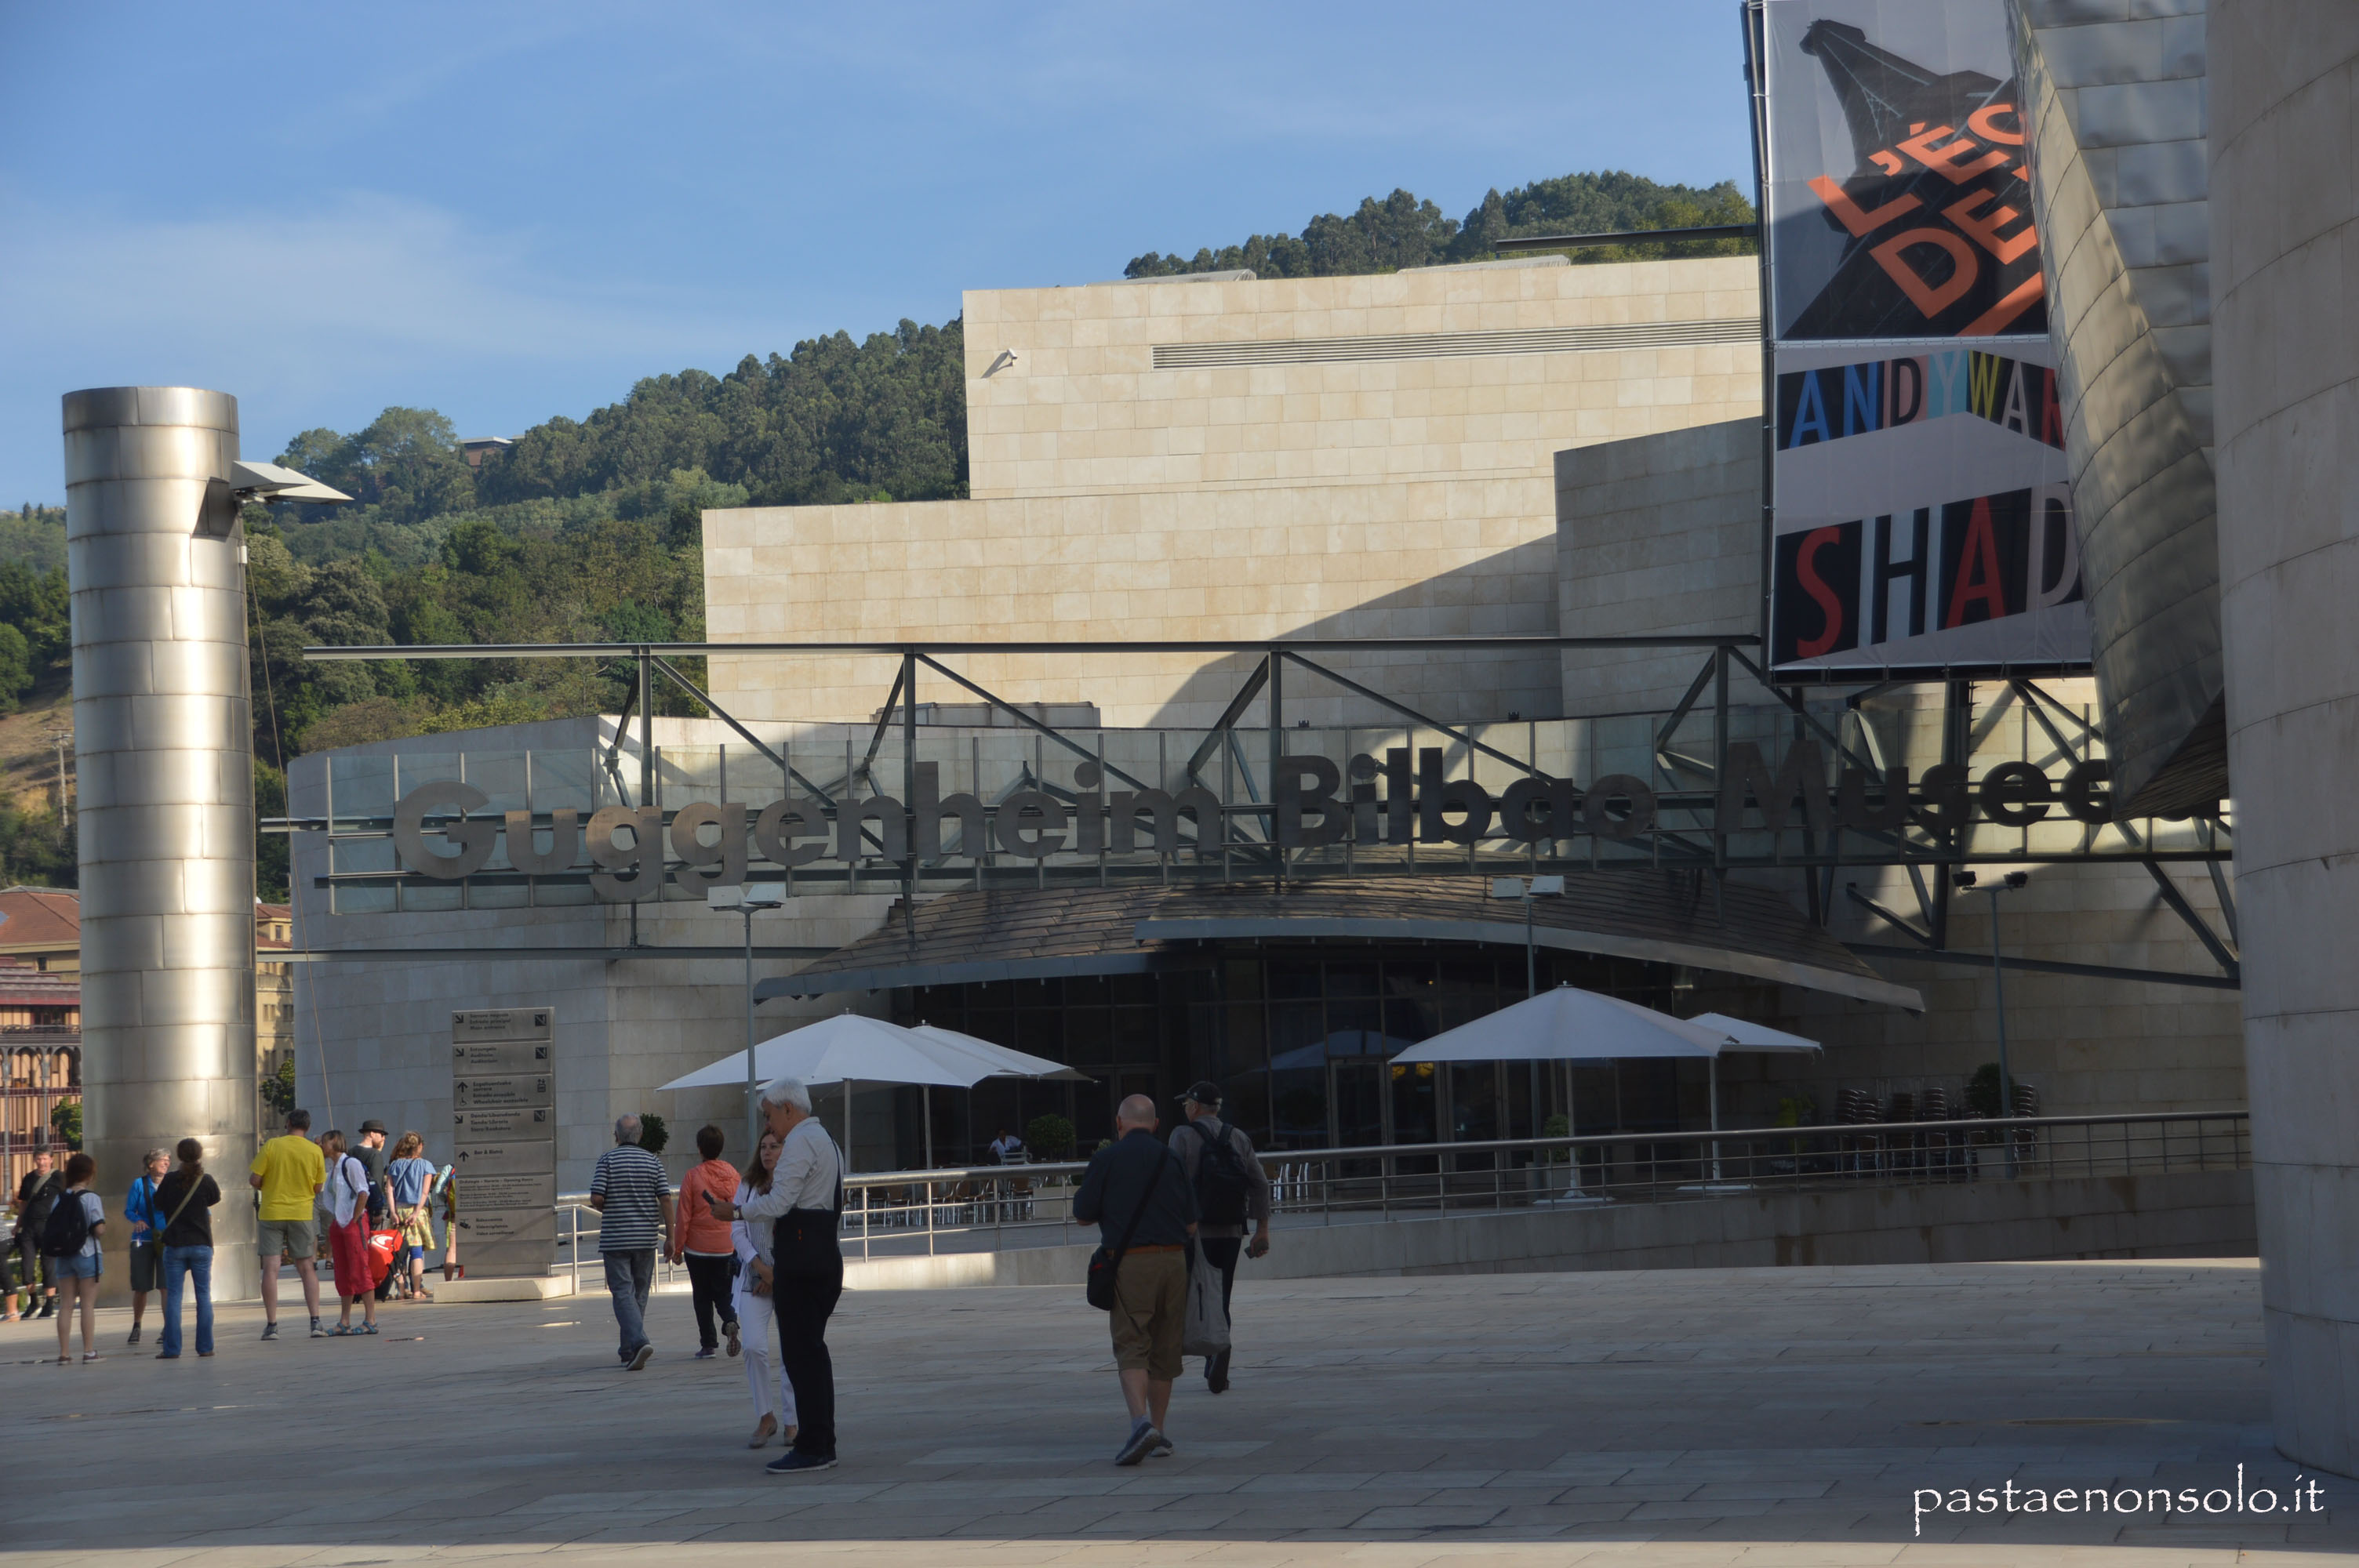 Vacanza in Spagna: Santander, San Sebastian, Bilbao